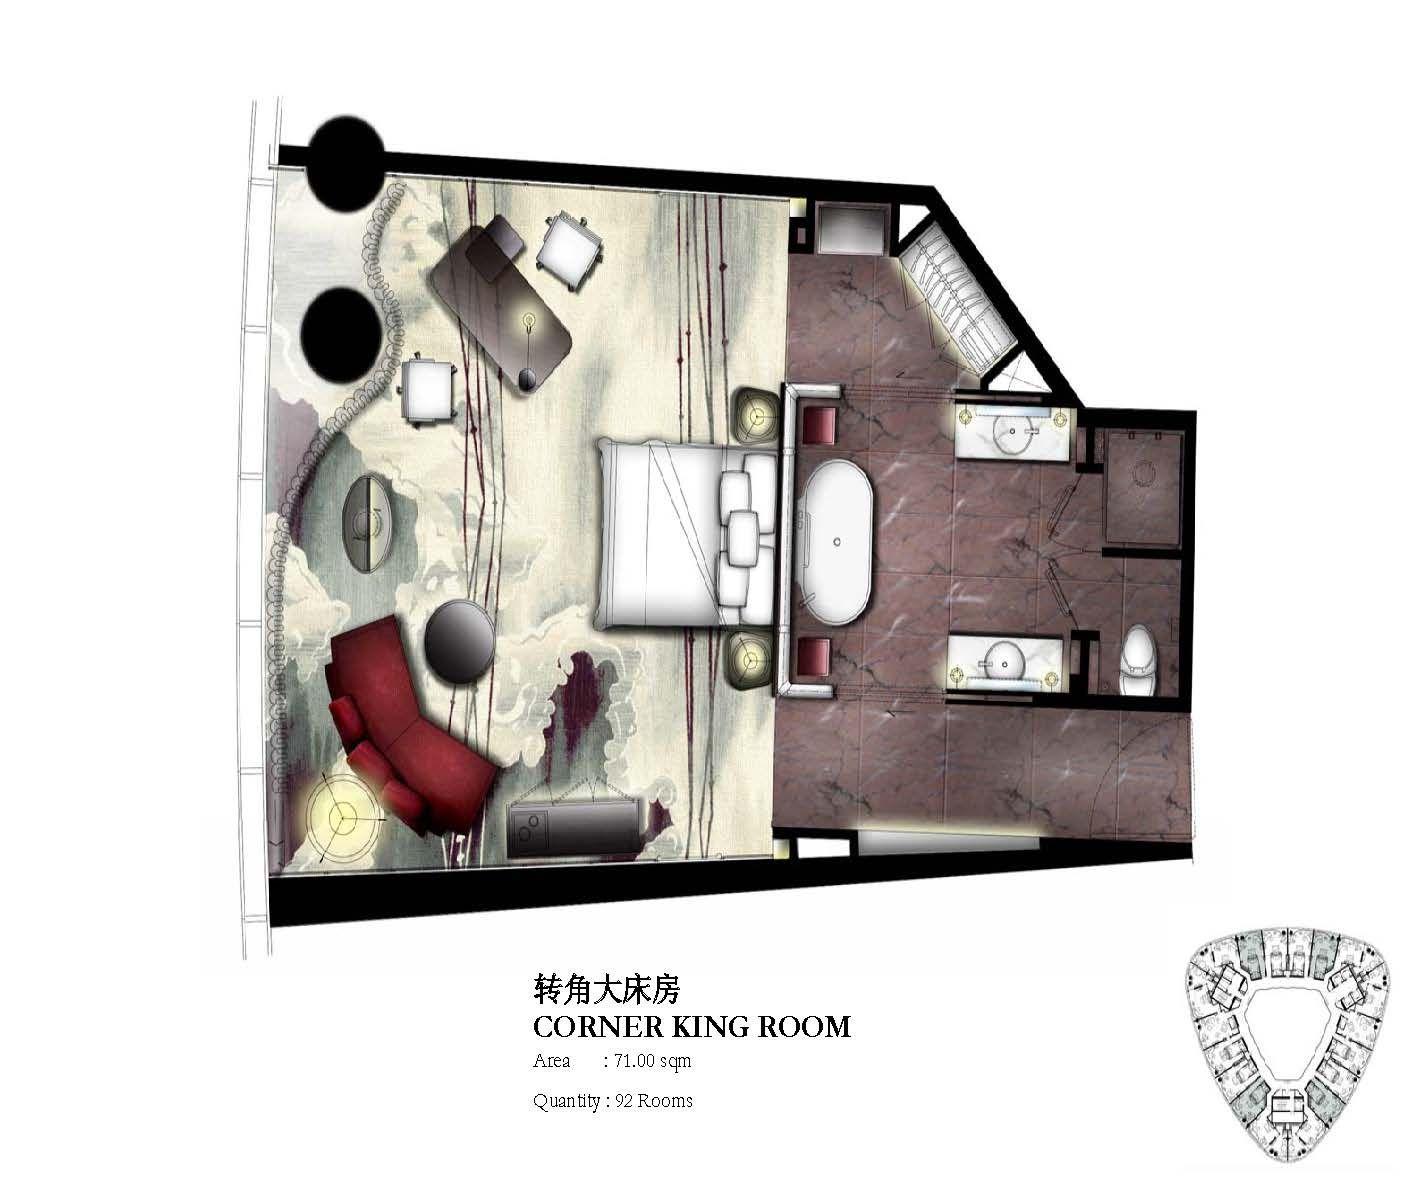 Corner King Guestroom Key Plan For Four Seasons Hotel Guangzhou Designed By Hba Hirsch Bedner Associates